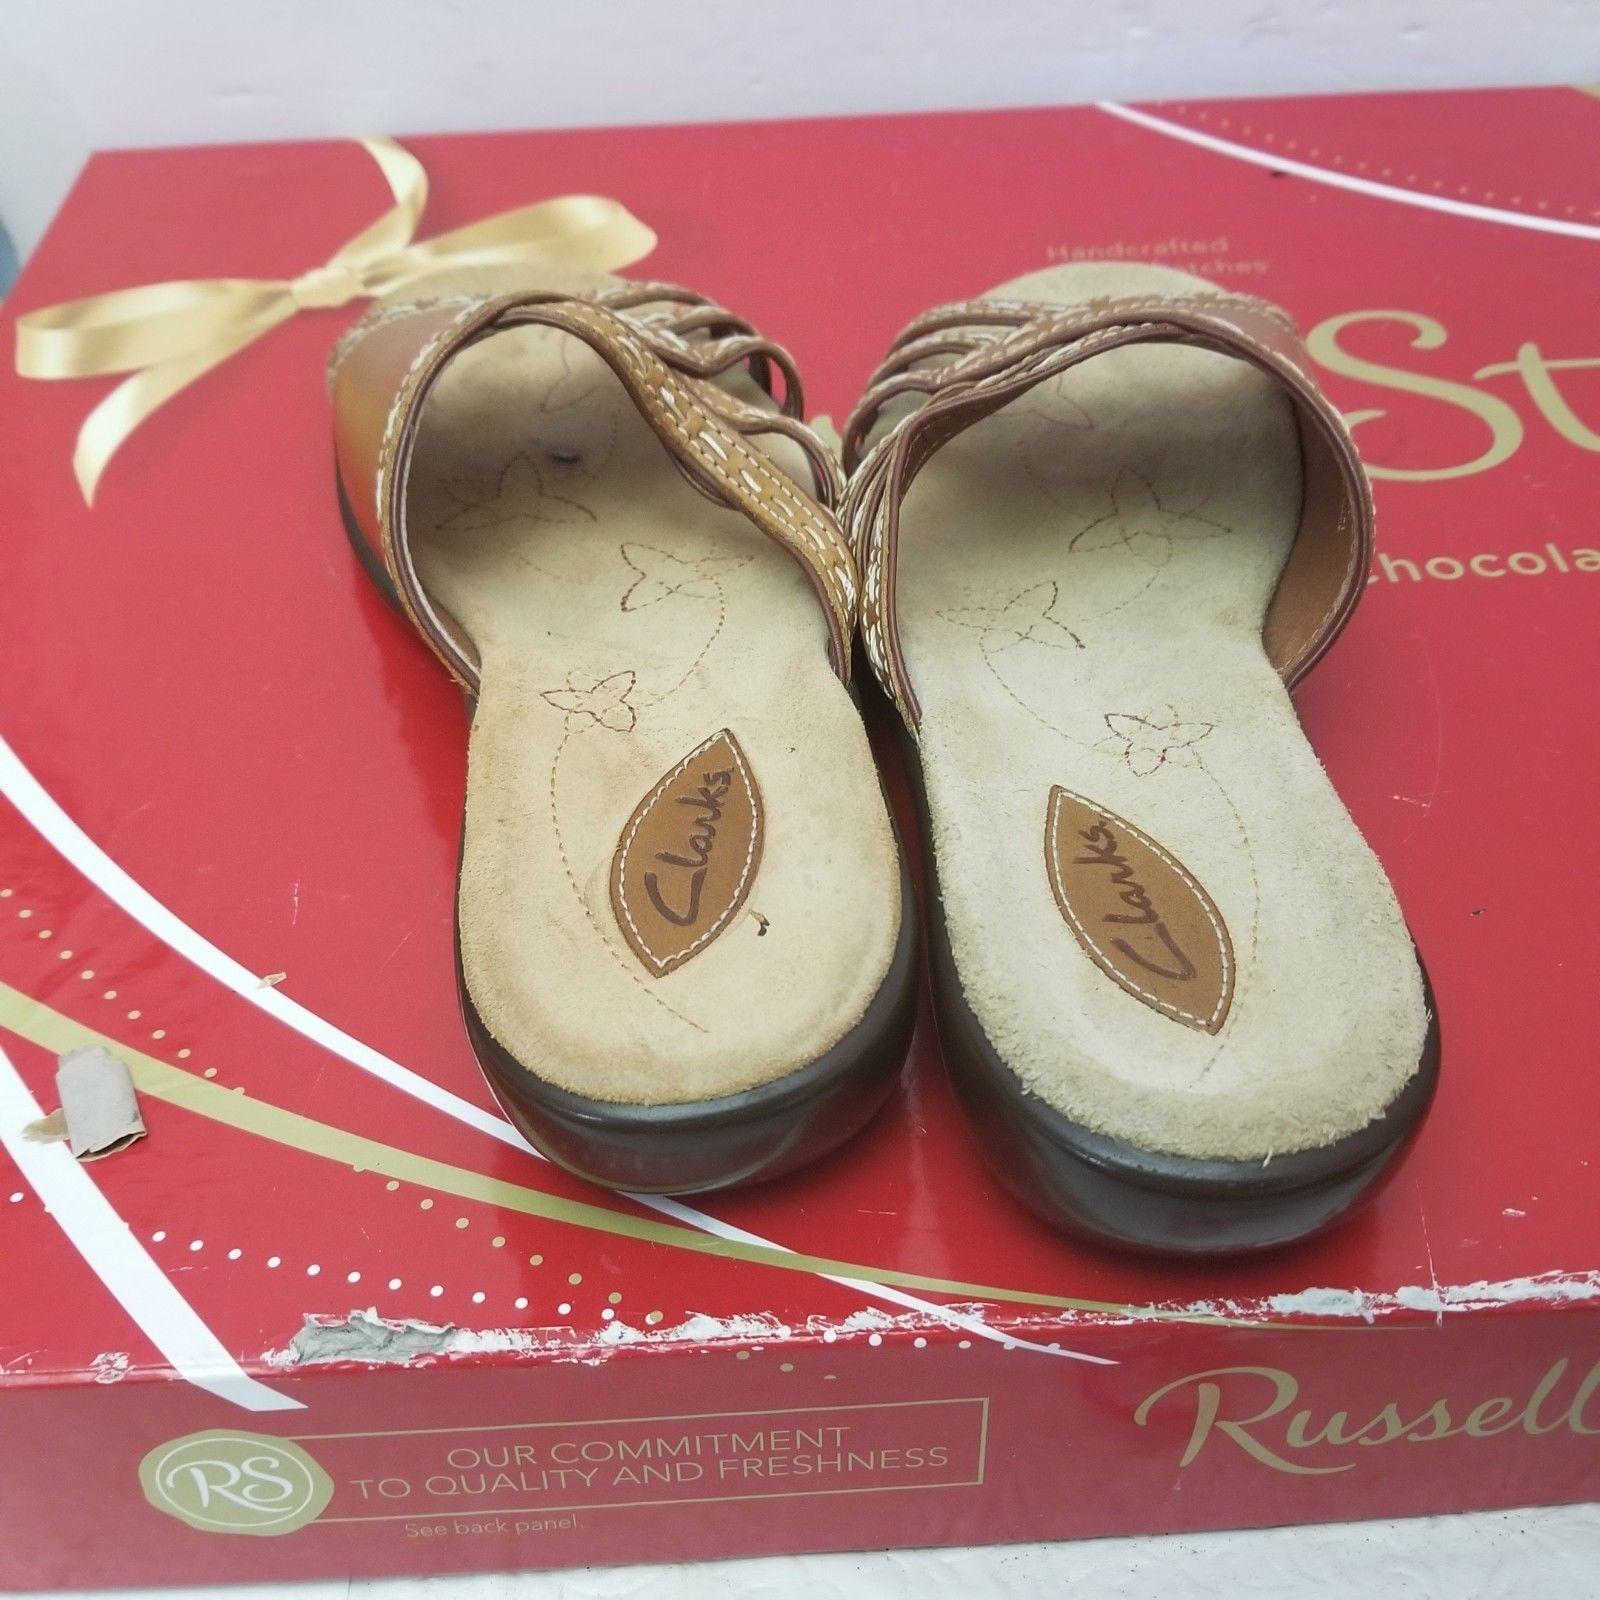 CLARKS Women's Brown Stitch Trim Leather Comfort Slides Sandals #75273  Sz 8 M